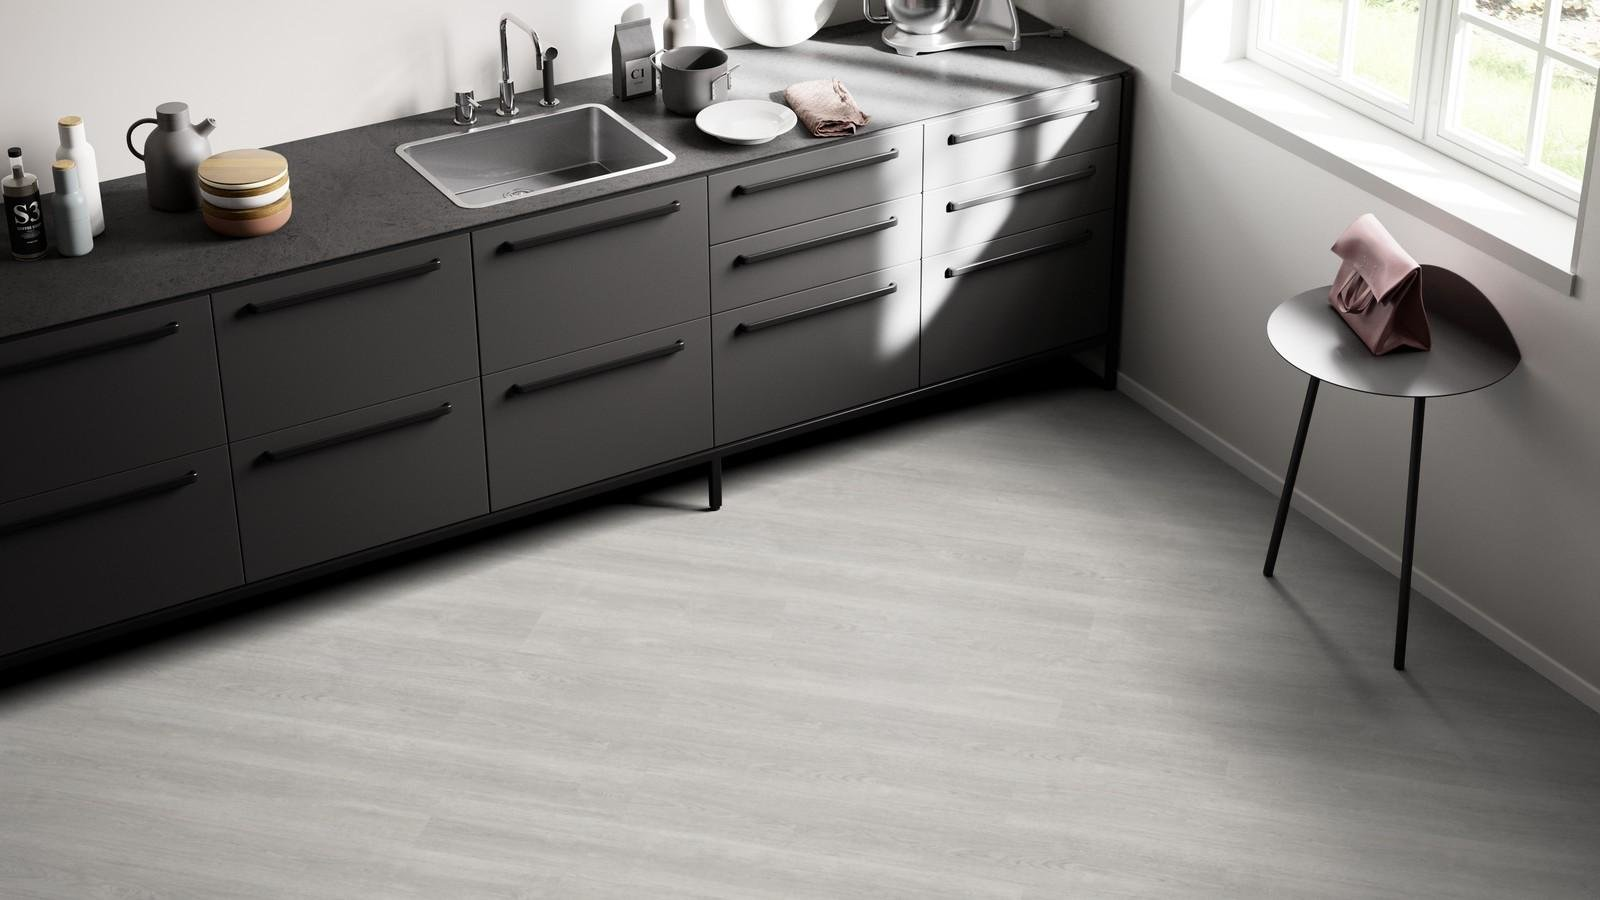 Виниловый пол на кухне фото